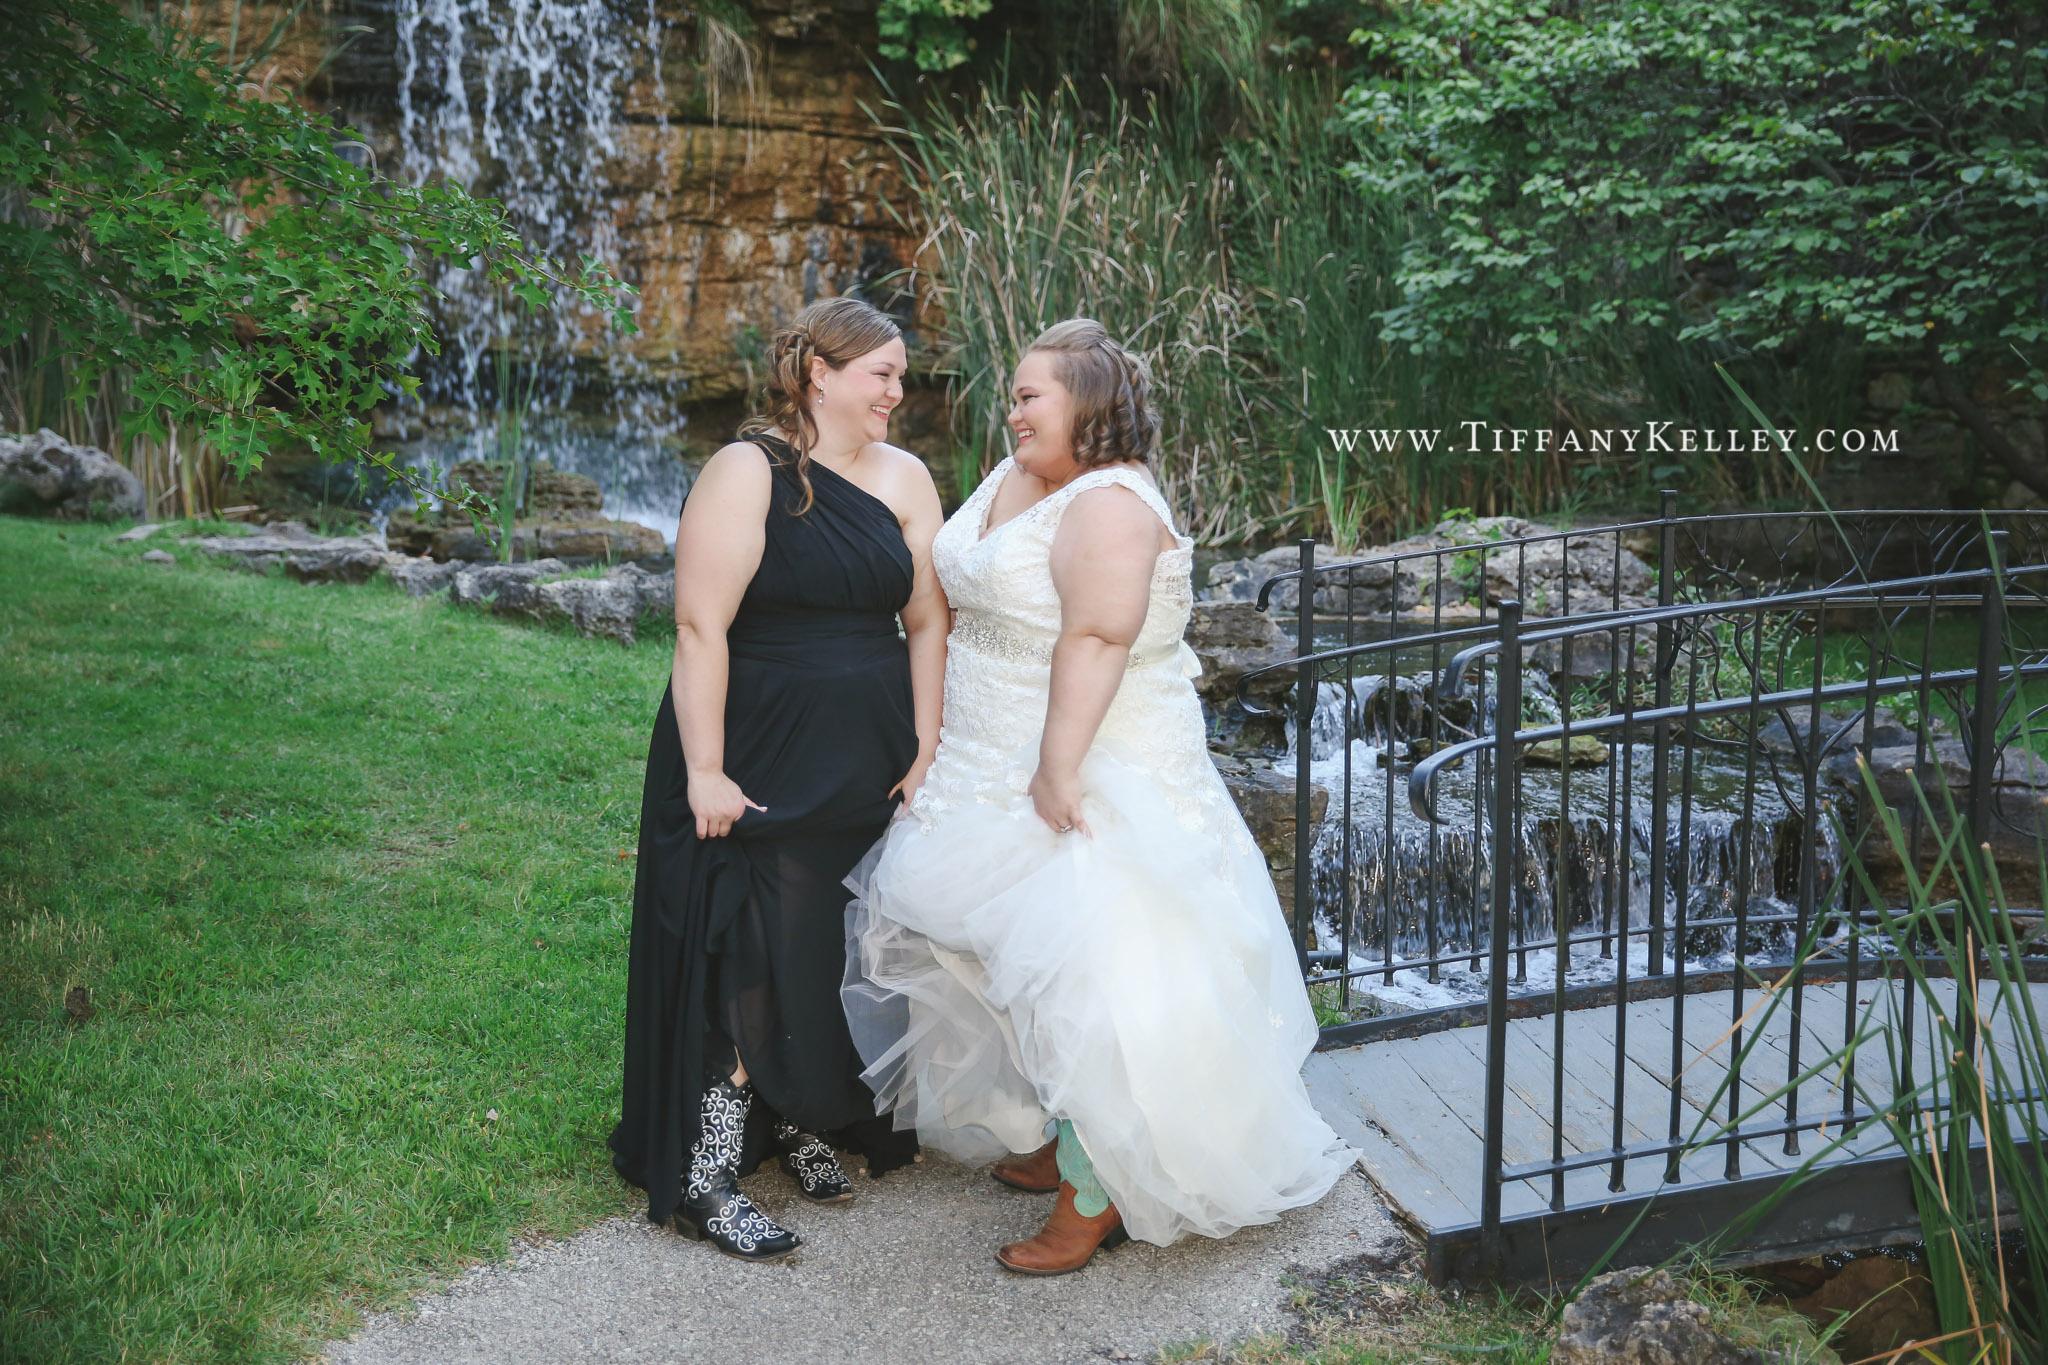 branson-missouri-big-cedar-lodge-wedding-photographer-tiffany-kelley-photography-10